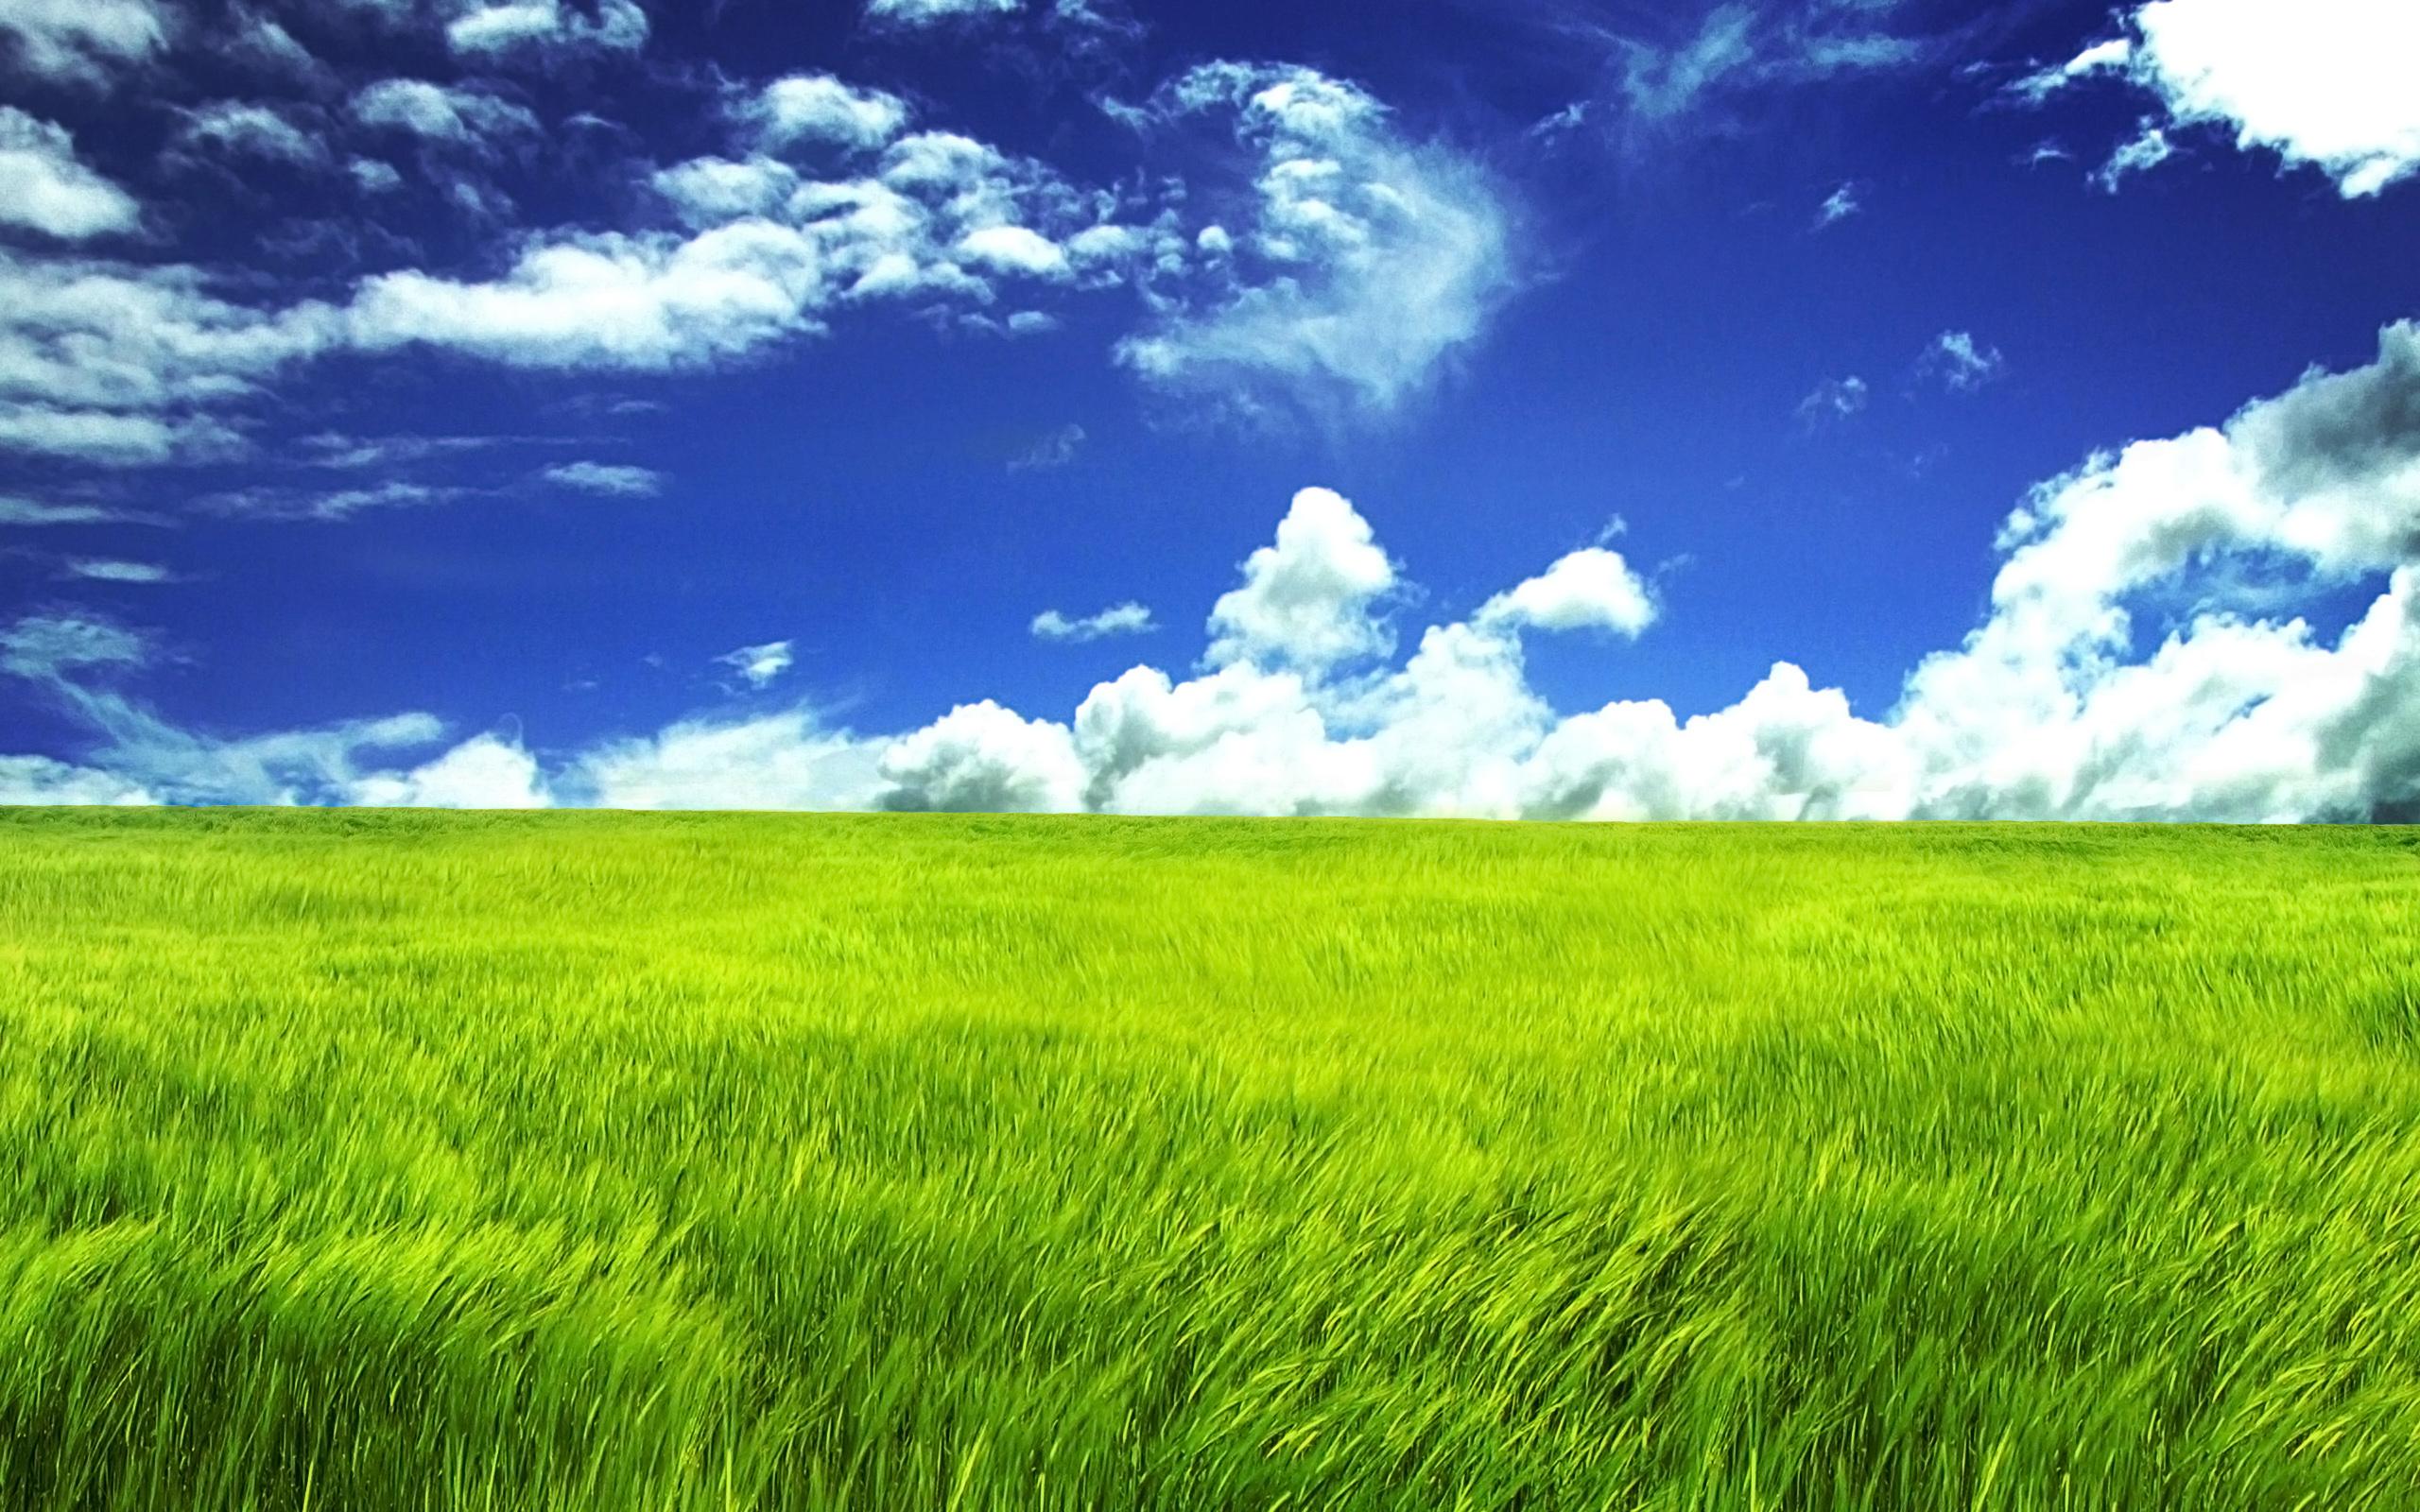 Greengrass Field